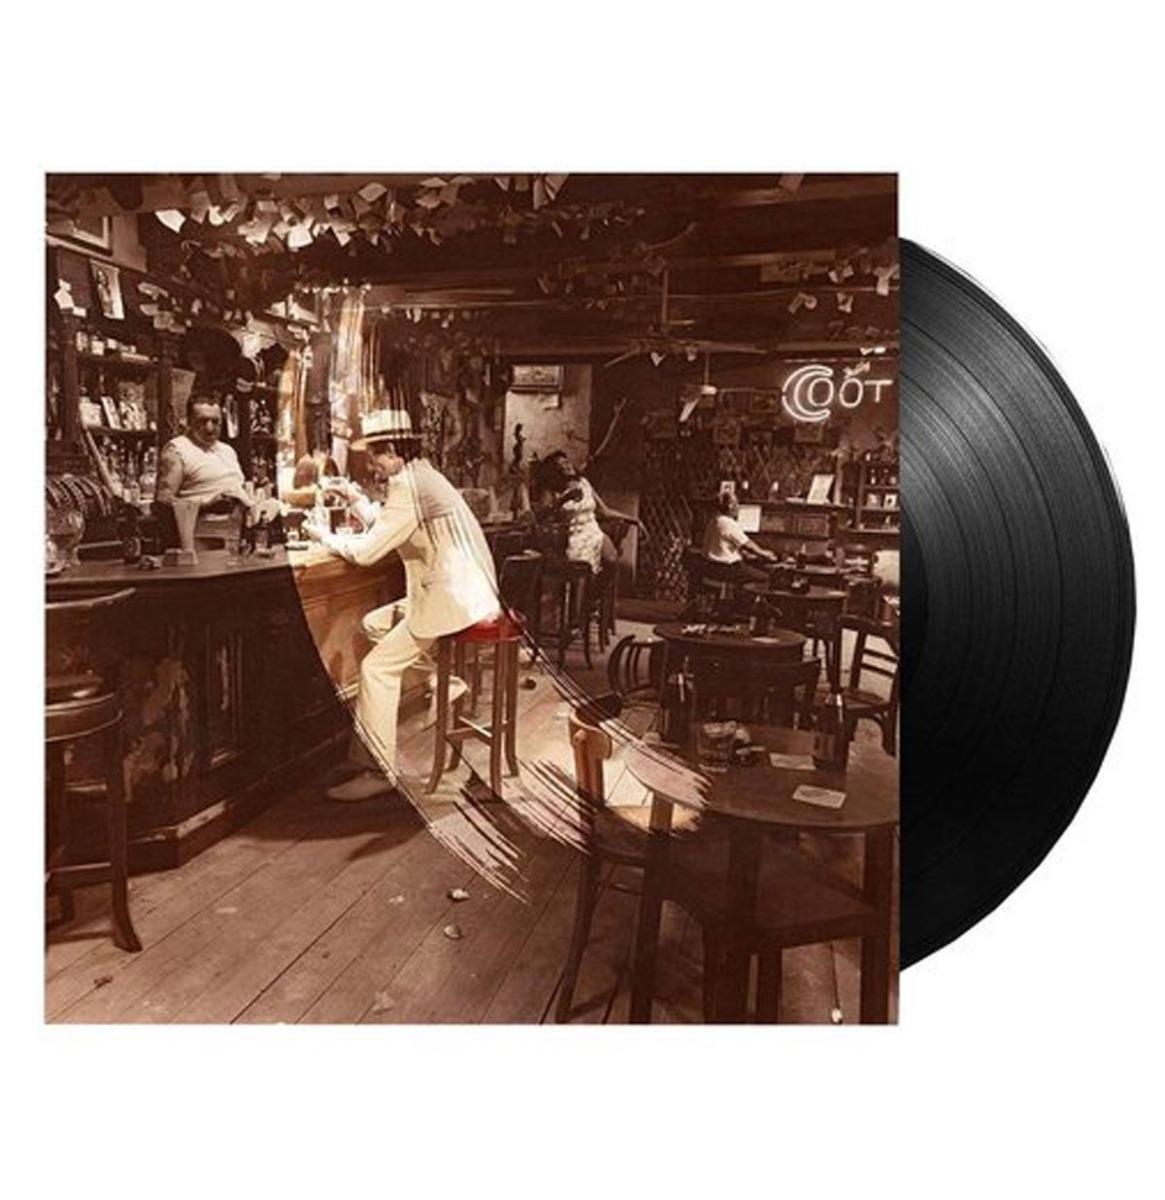 Led Zeppelin - In Through The Out Door LP